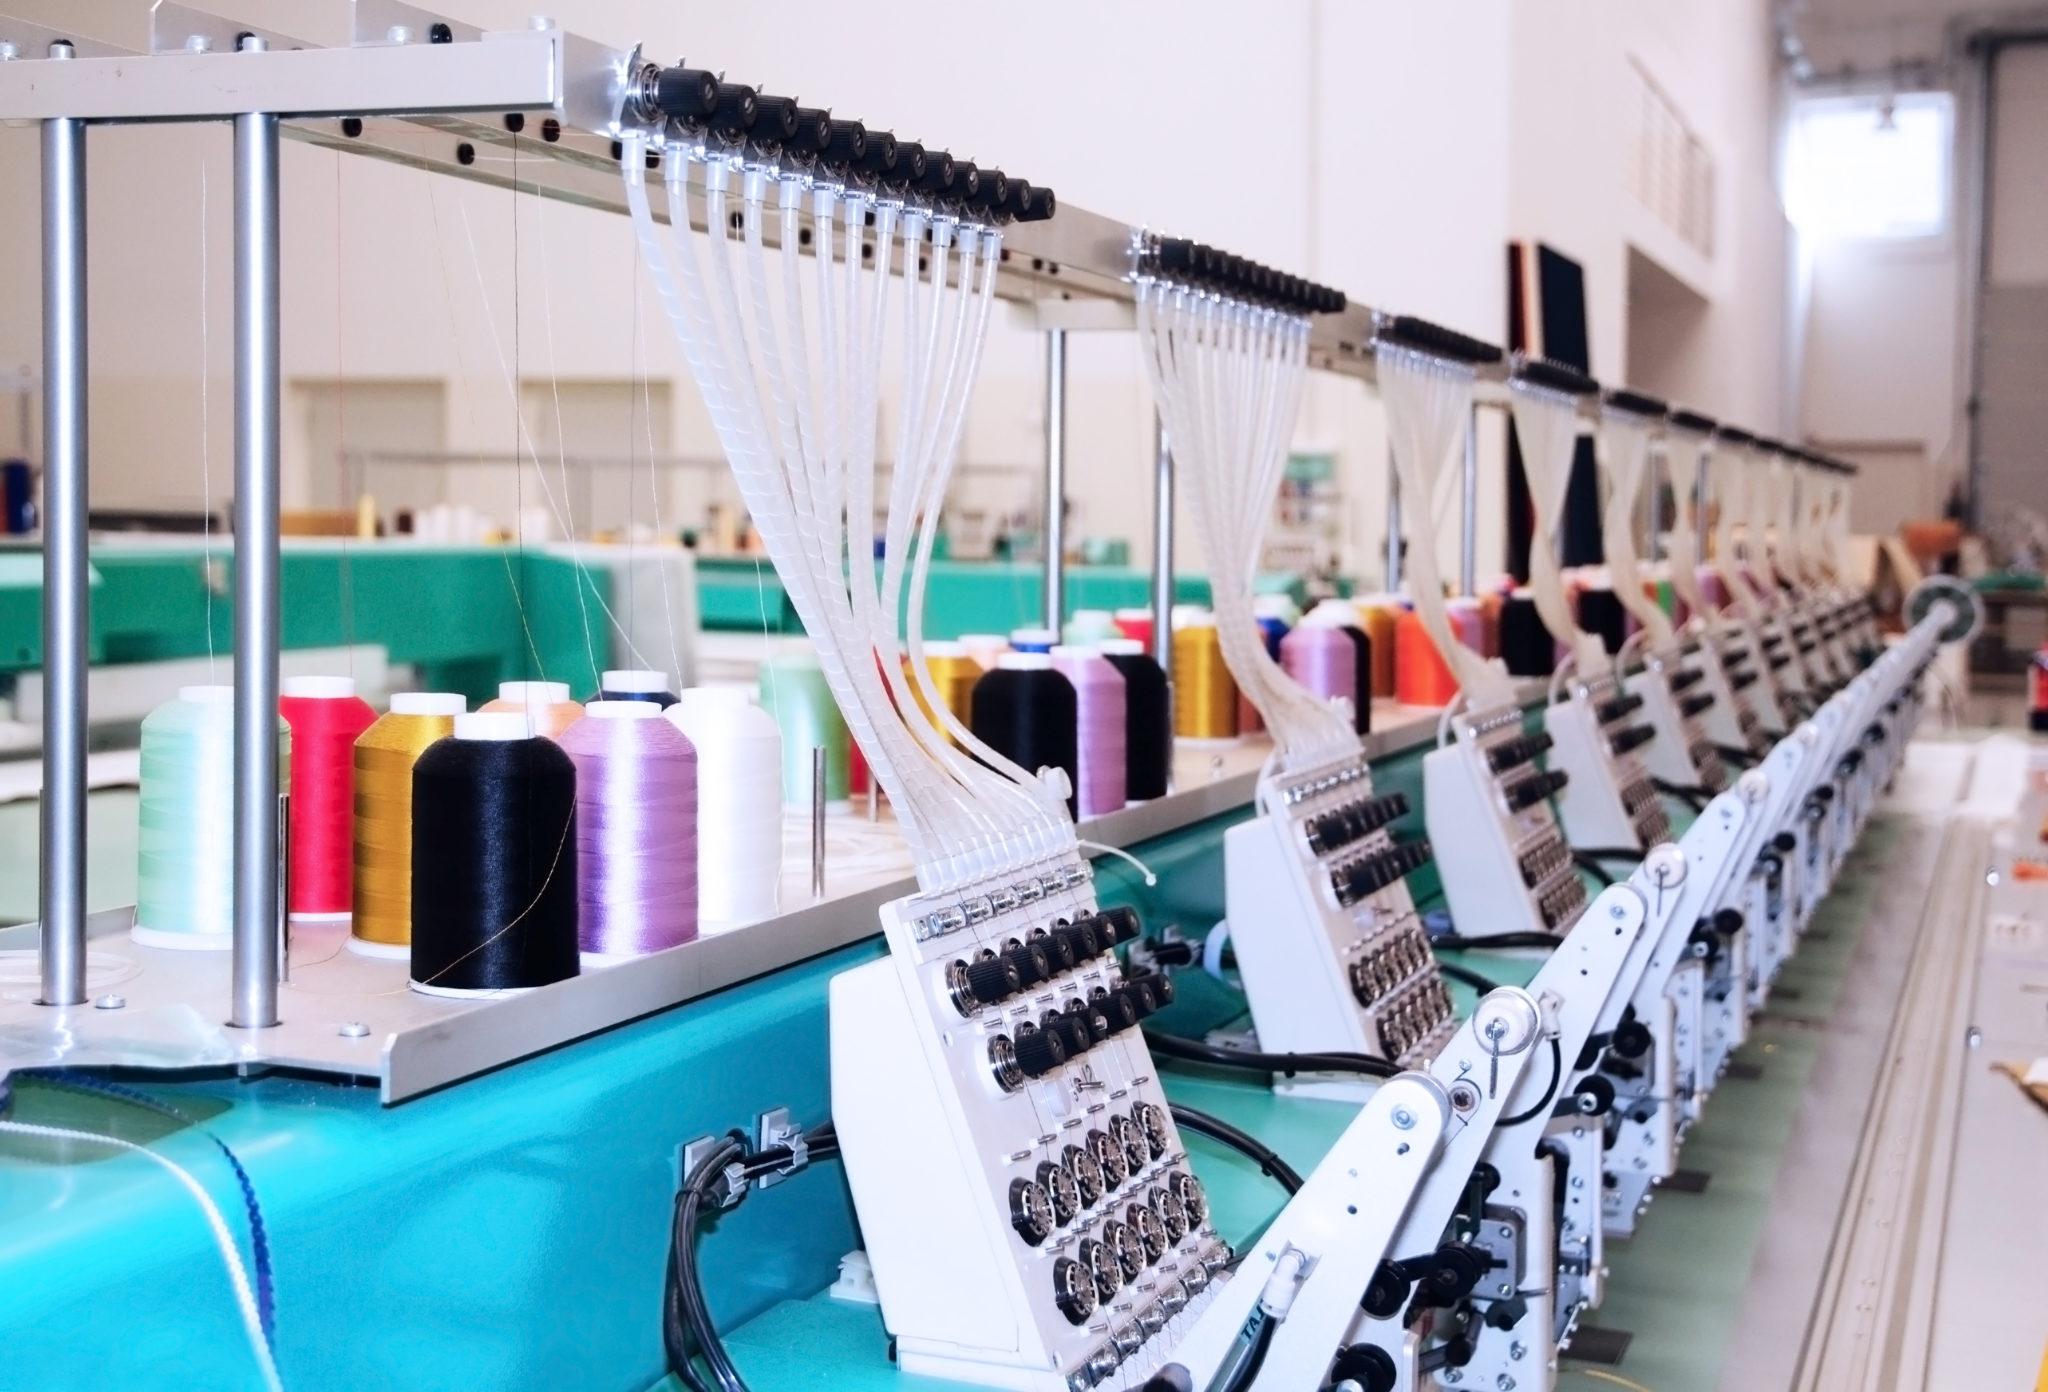 Textile steam boilers